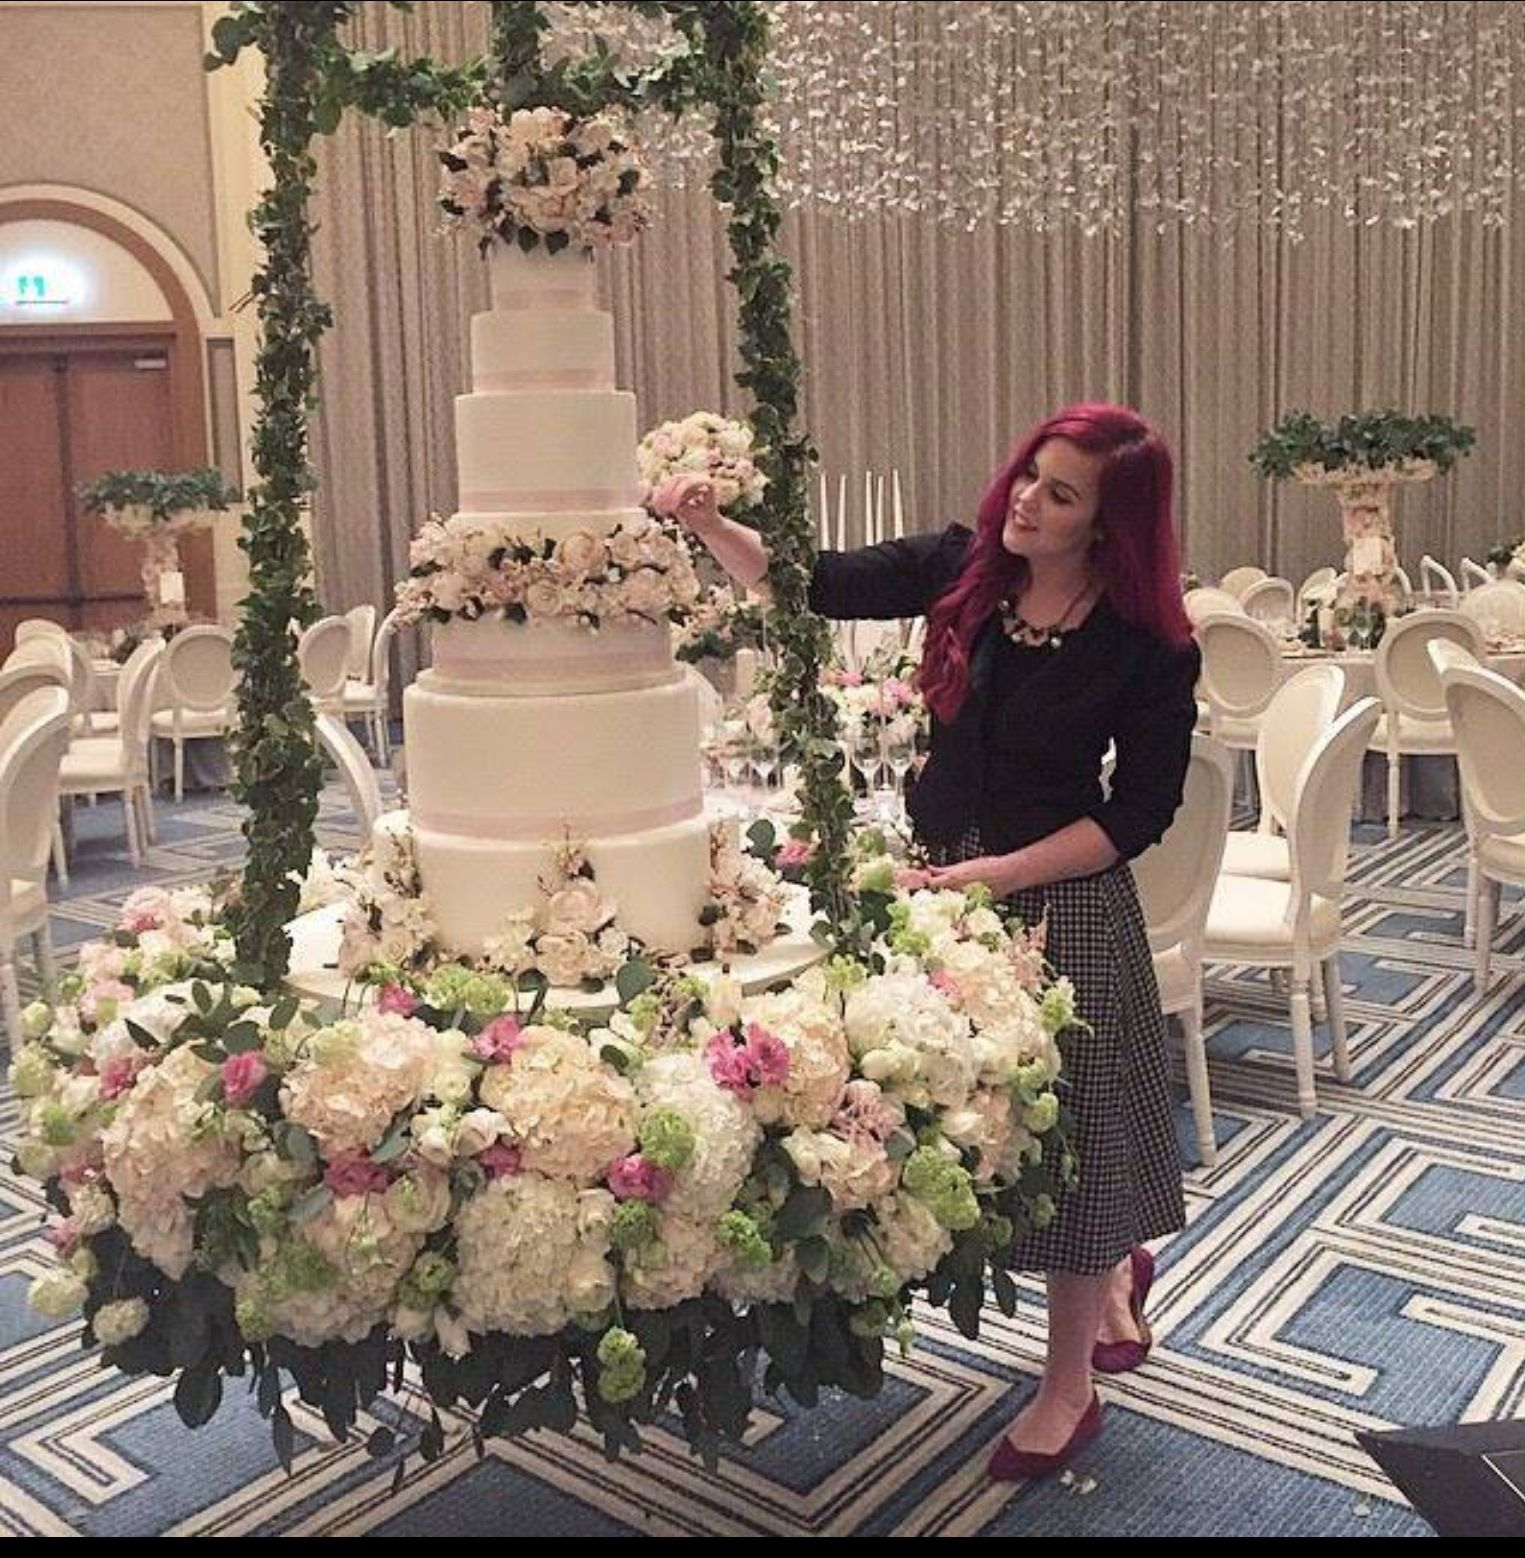 Amazing Weddings: Cake Pop __ Marshmallows